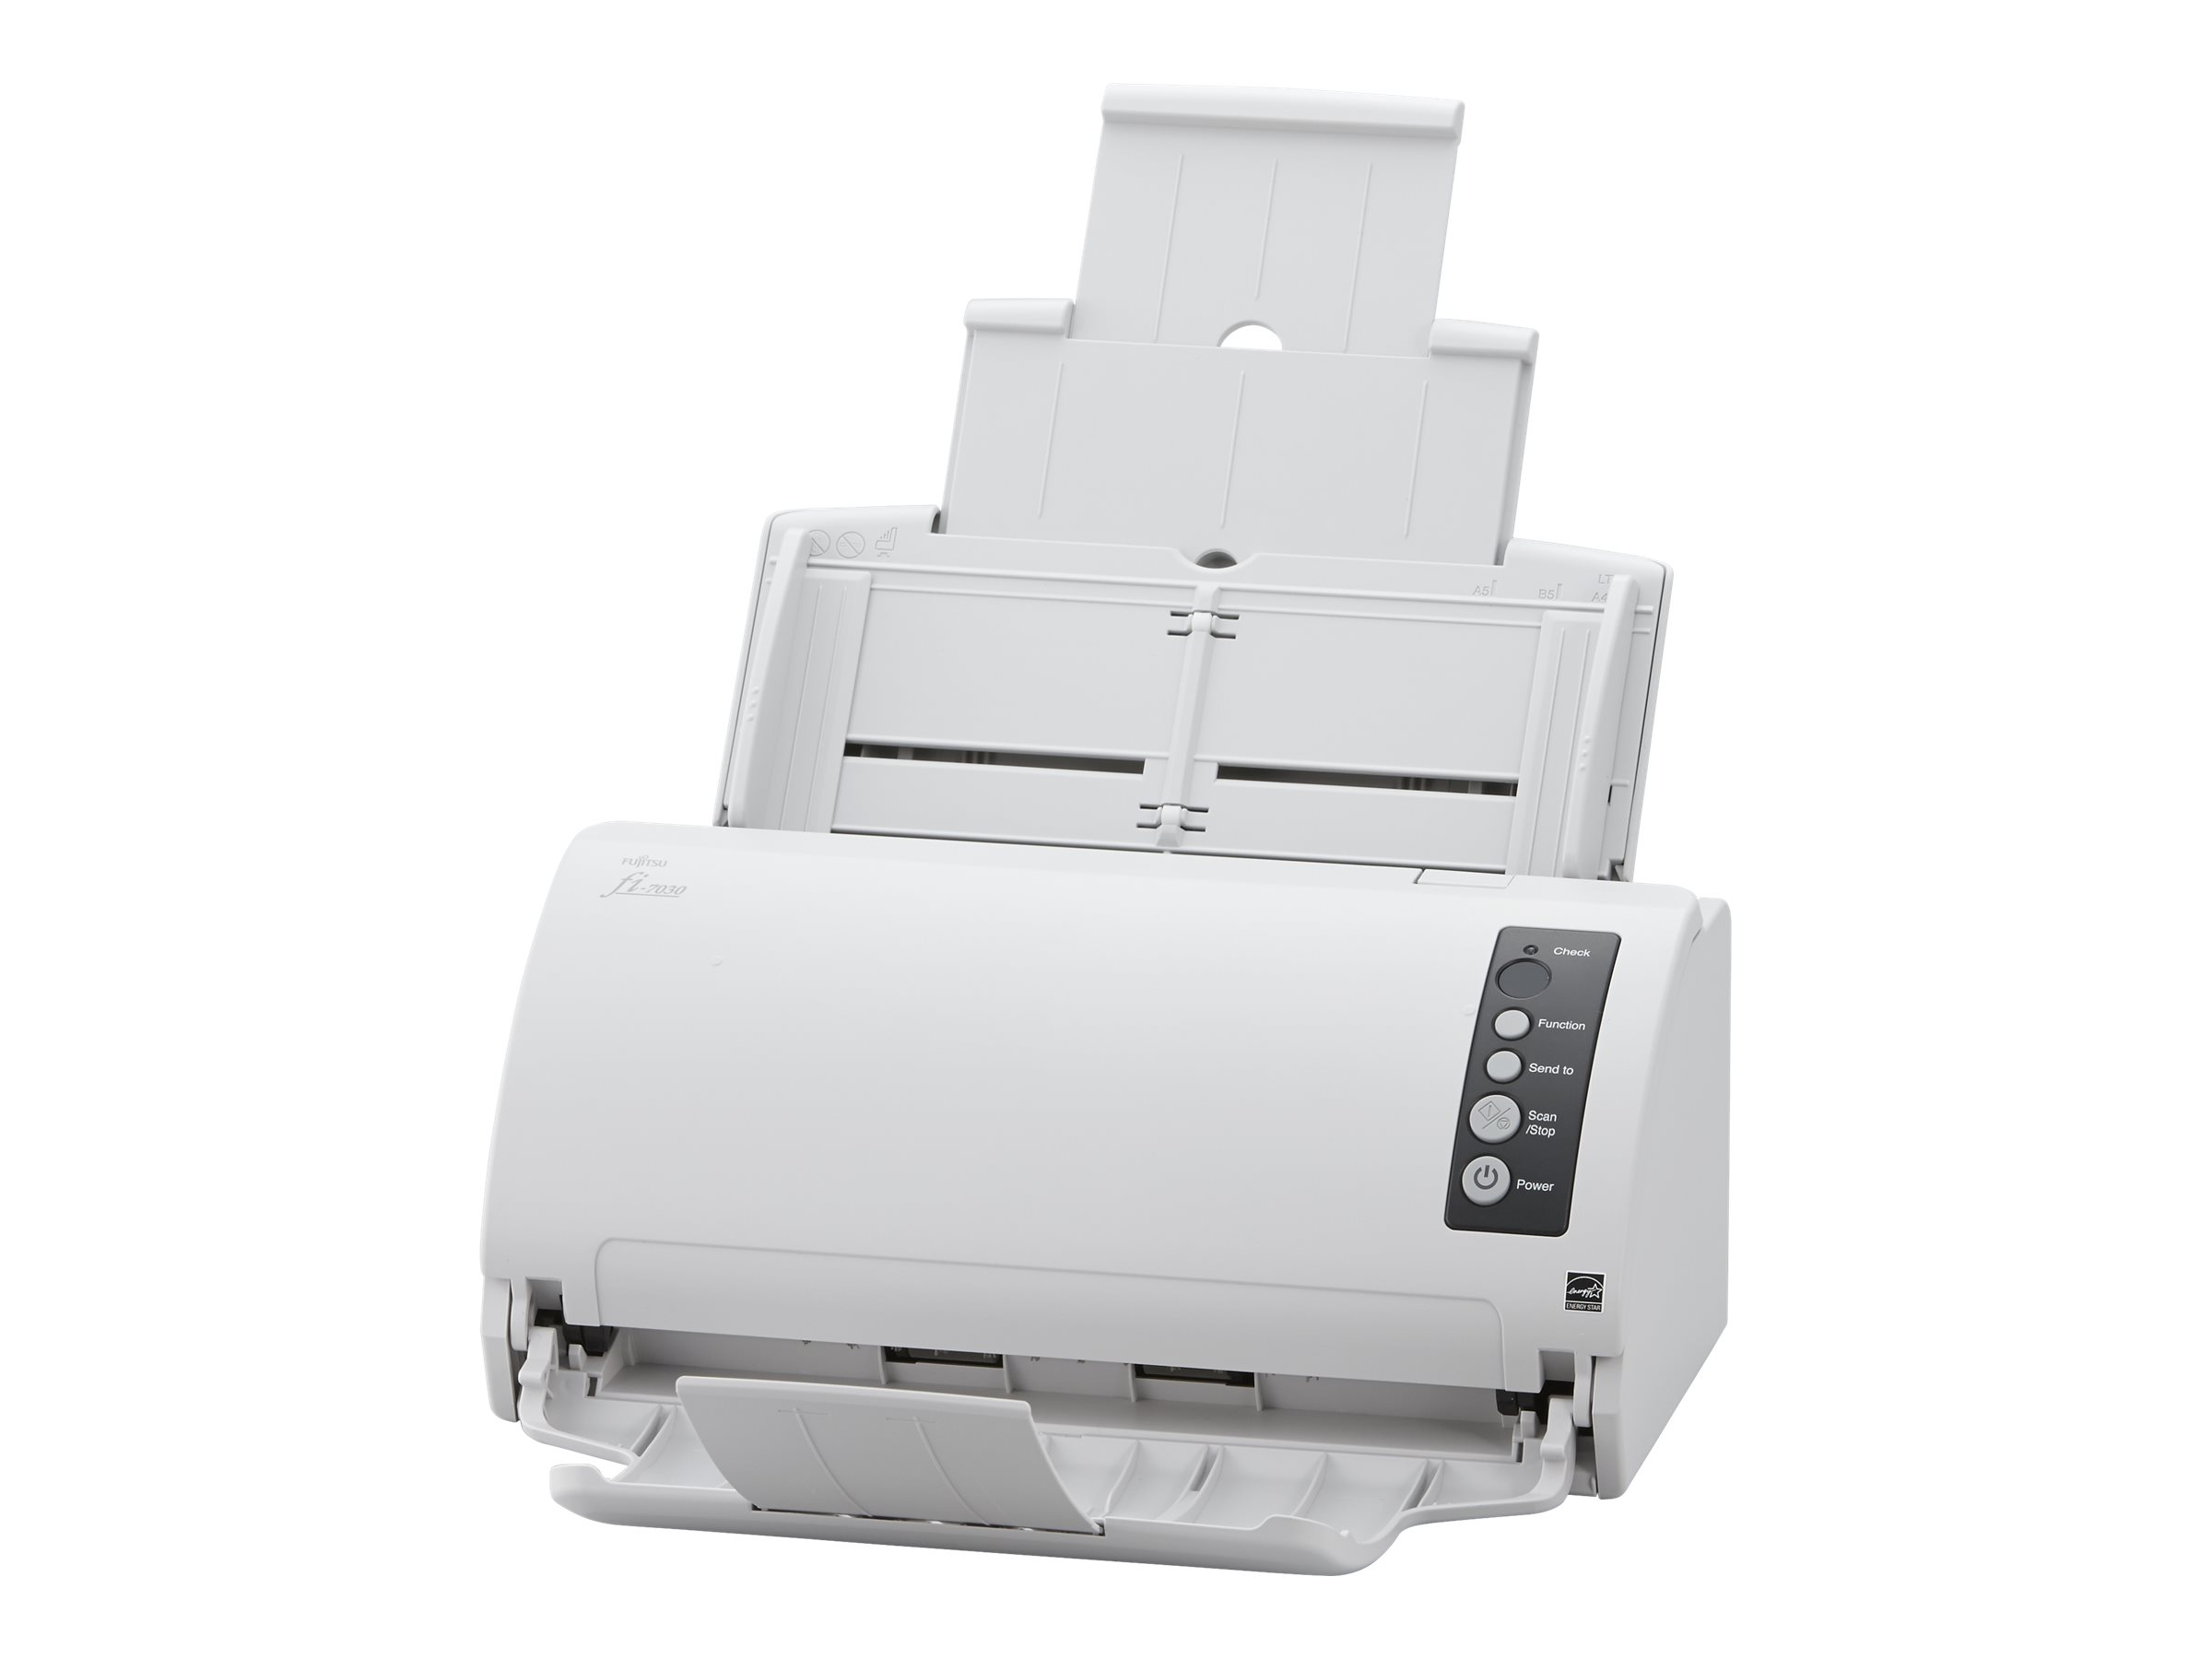 Fujitsu fi-7030 - Dokumentenscanner - Dual CIS - Duplex - 216 x 355.6 mm - 600 dpi x 600 dpi - bis zu 27 Seiten/Min. (einfarbig)